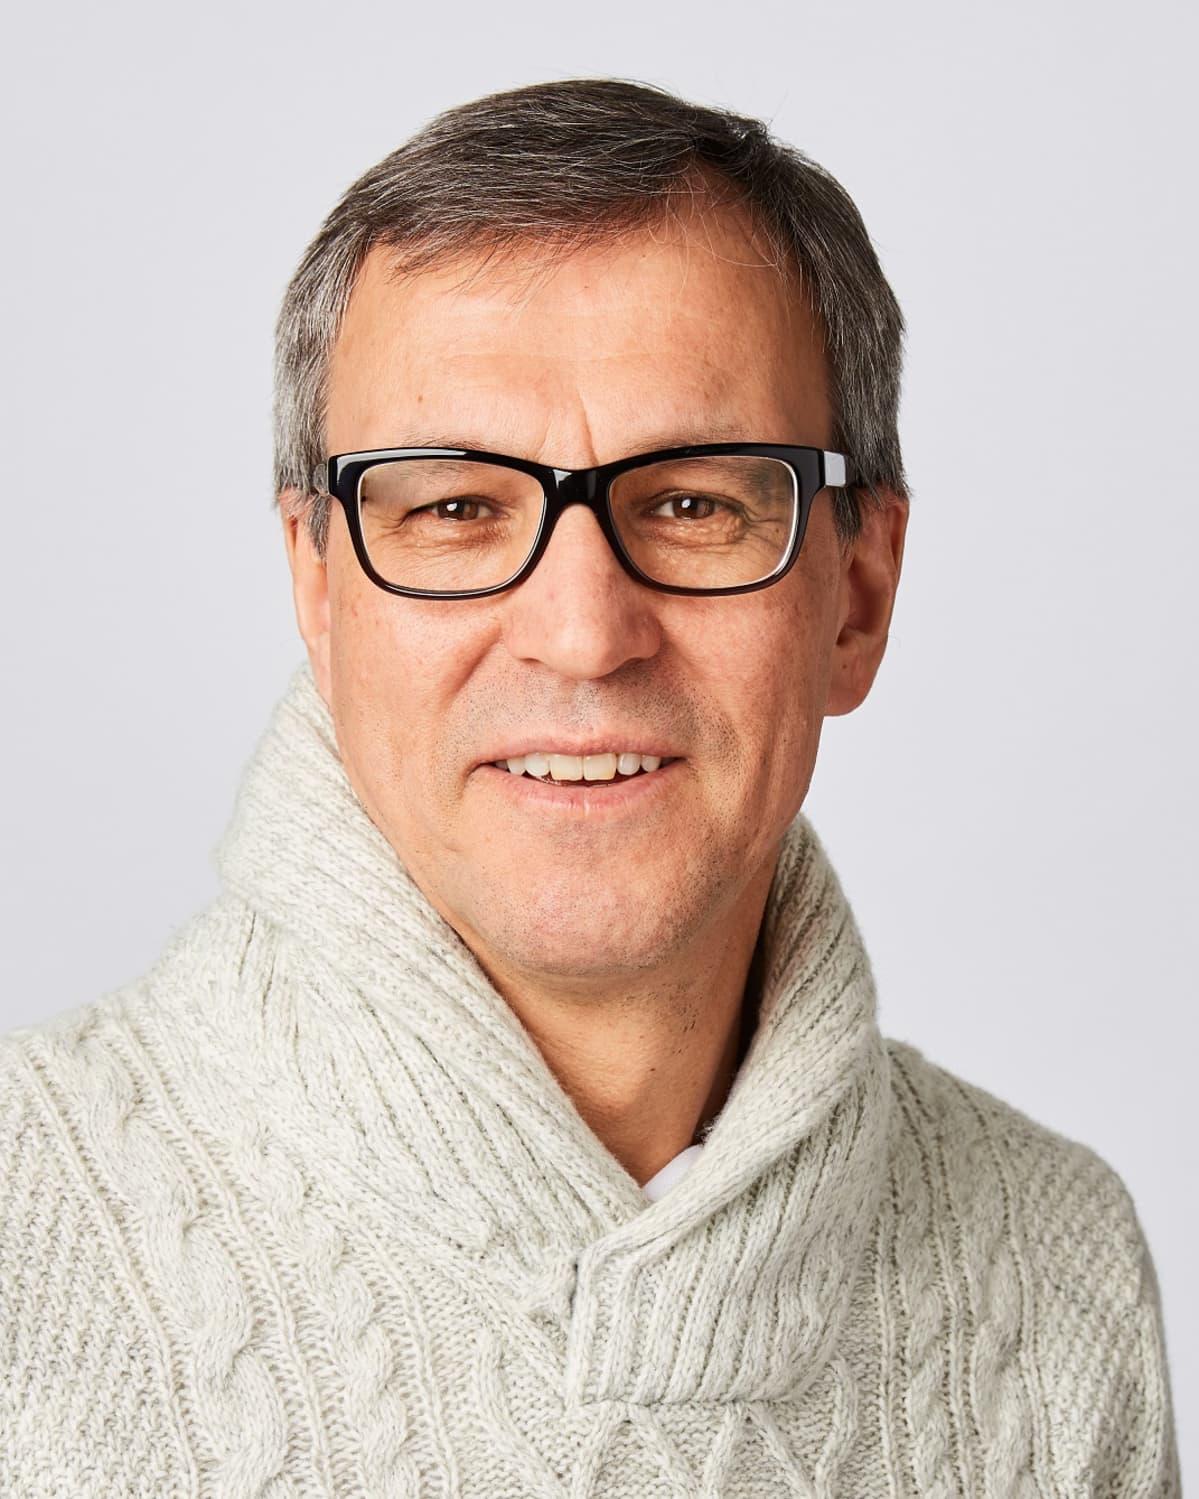 Juha Tapiola